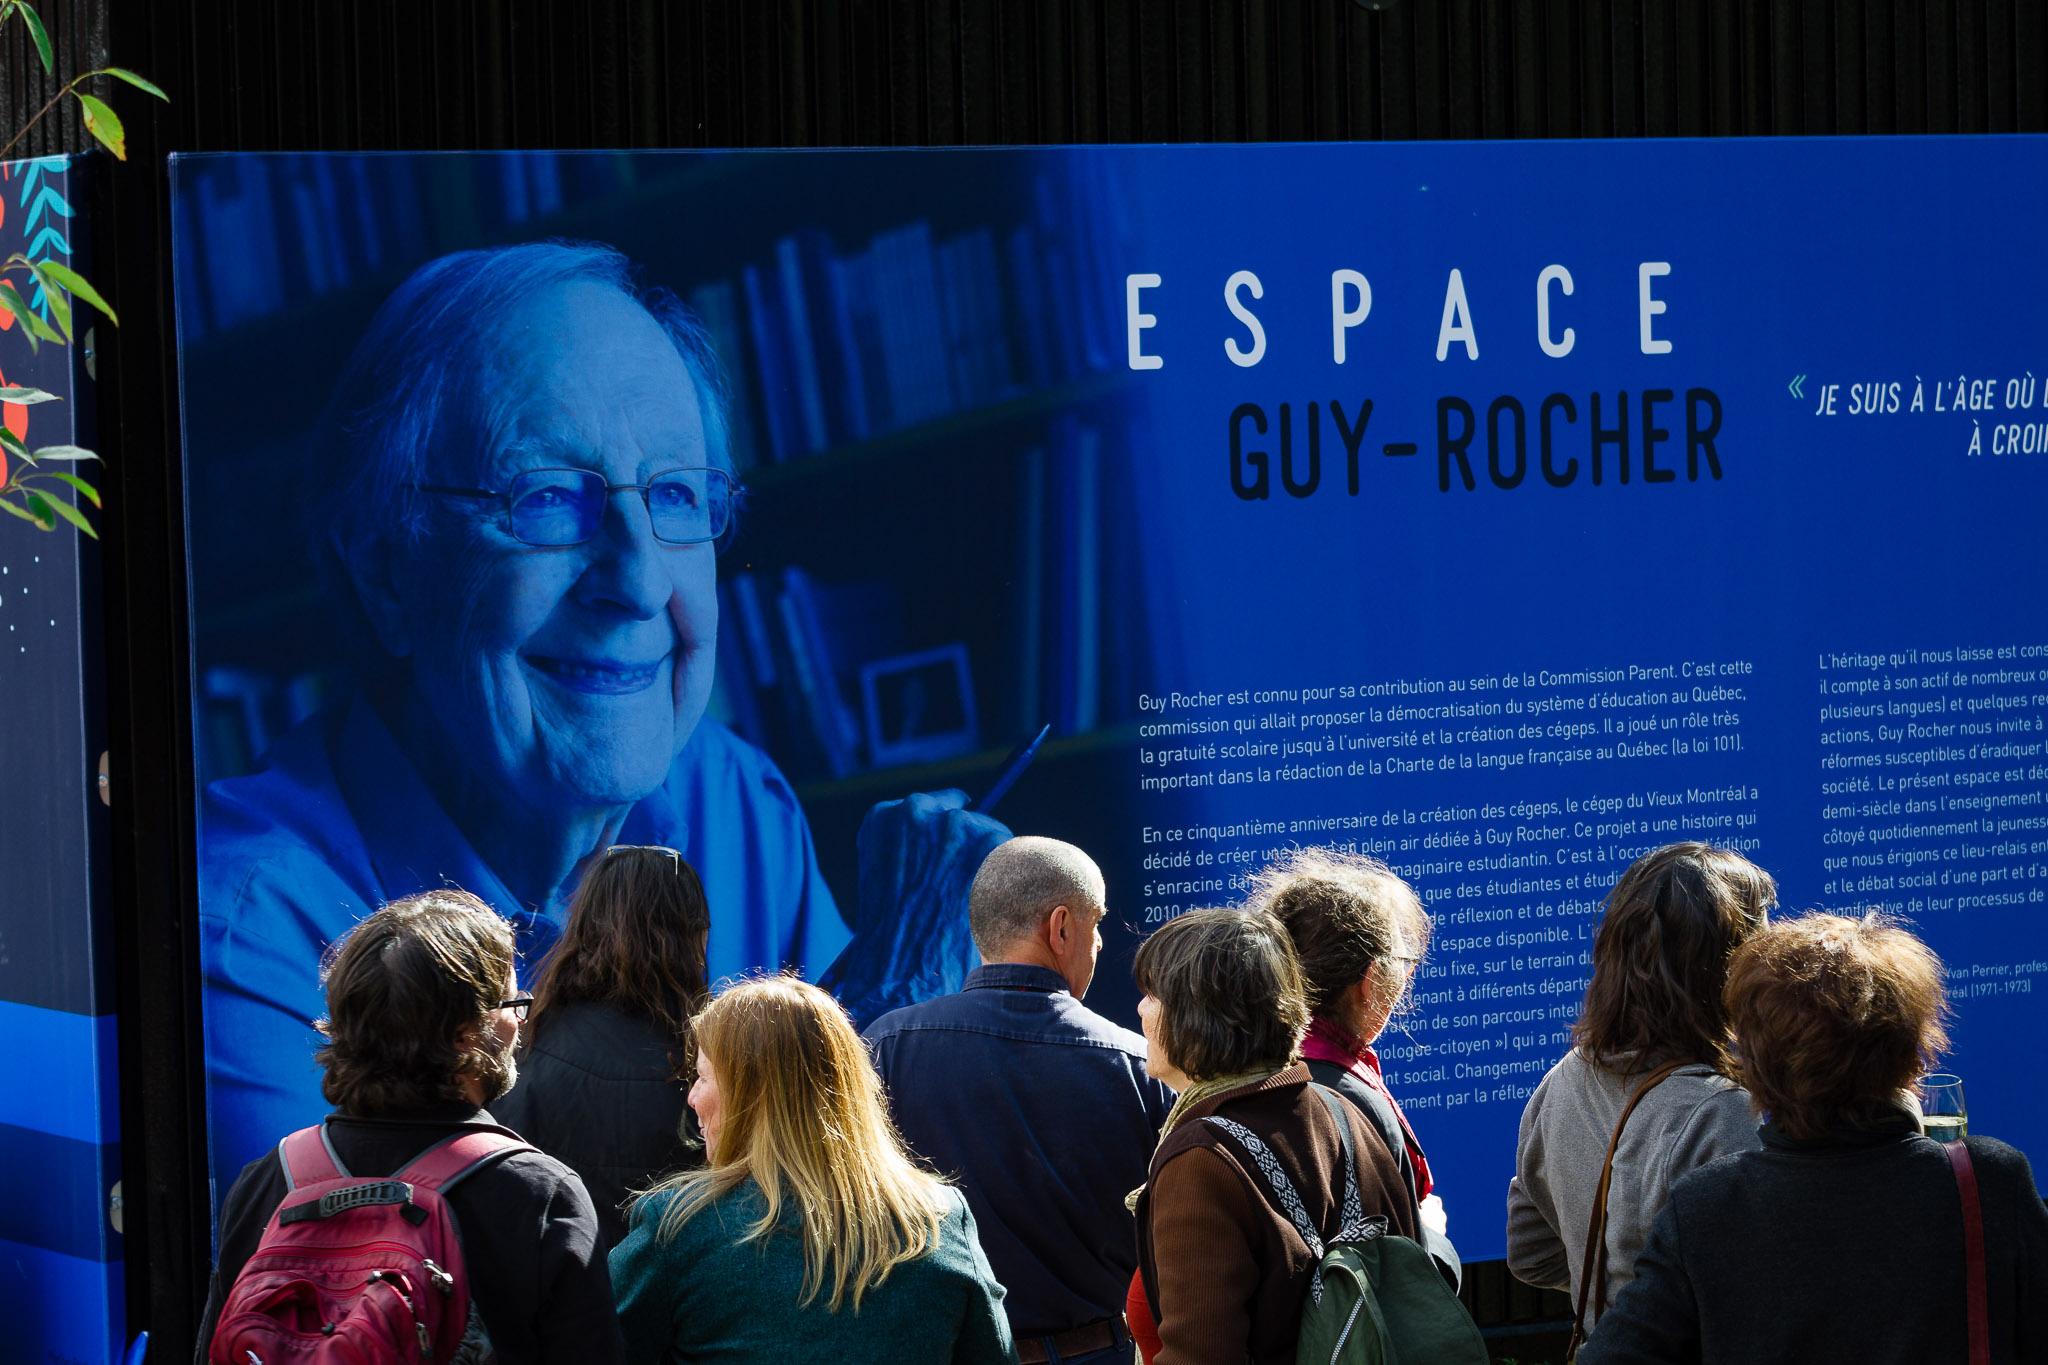 Espace Guy Rocher